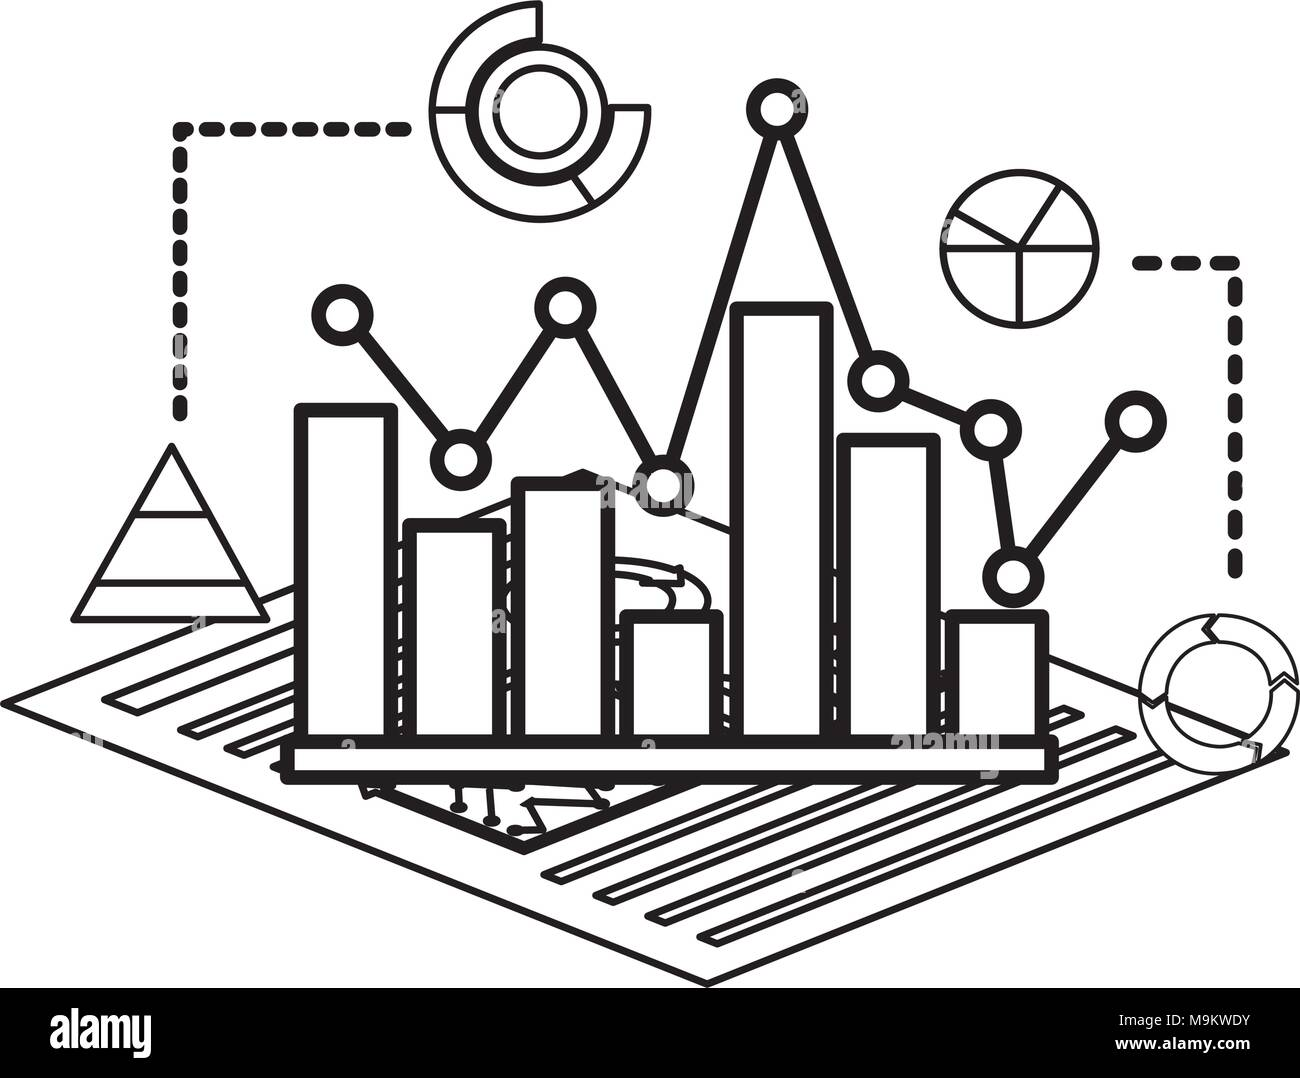 Pyramid Infographic Template Stock Photos & Pyramid Infographic ...